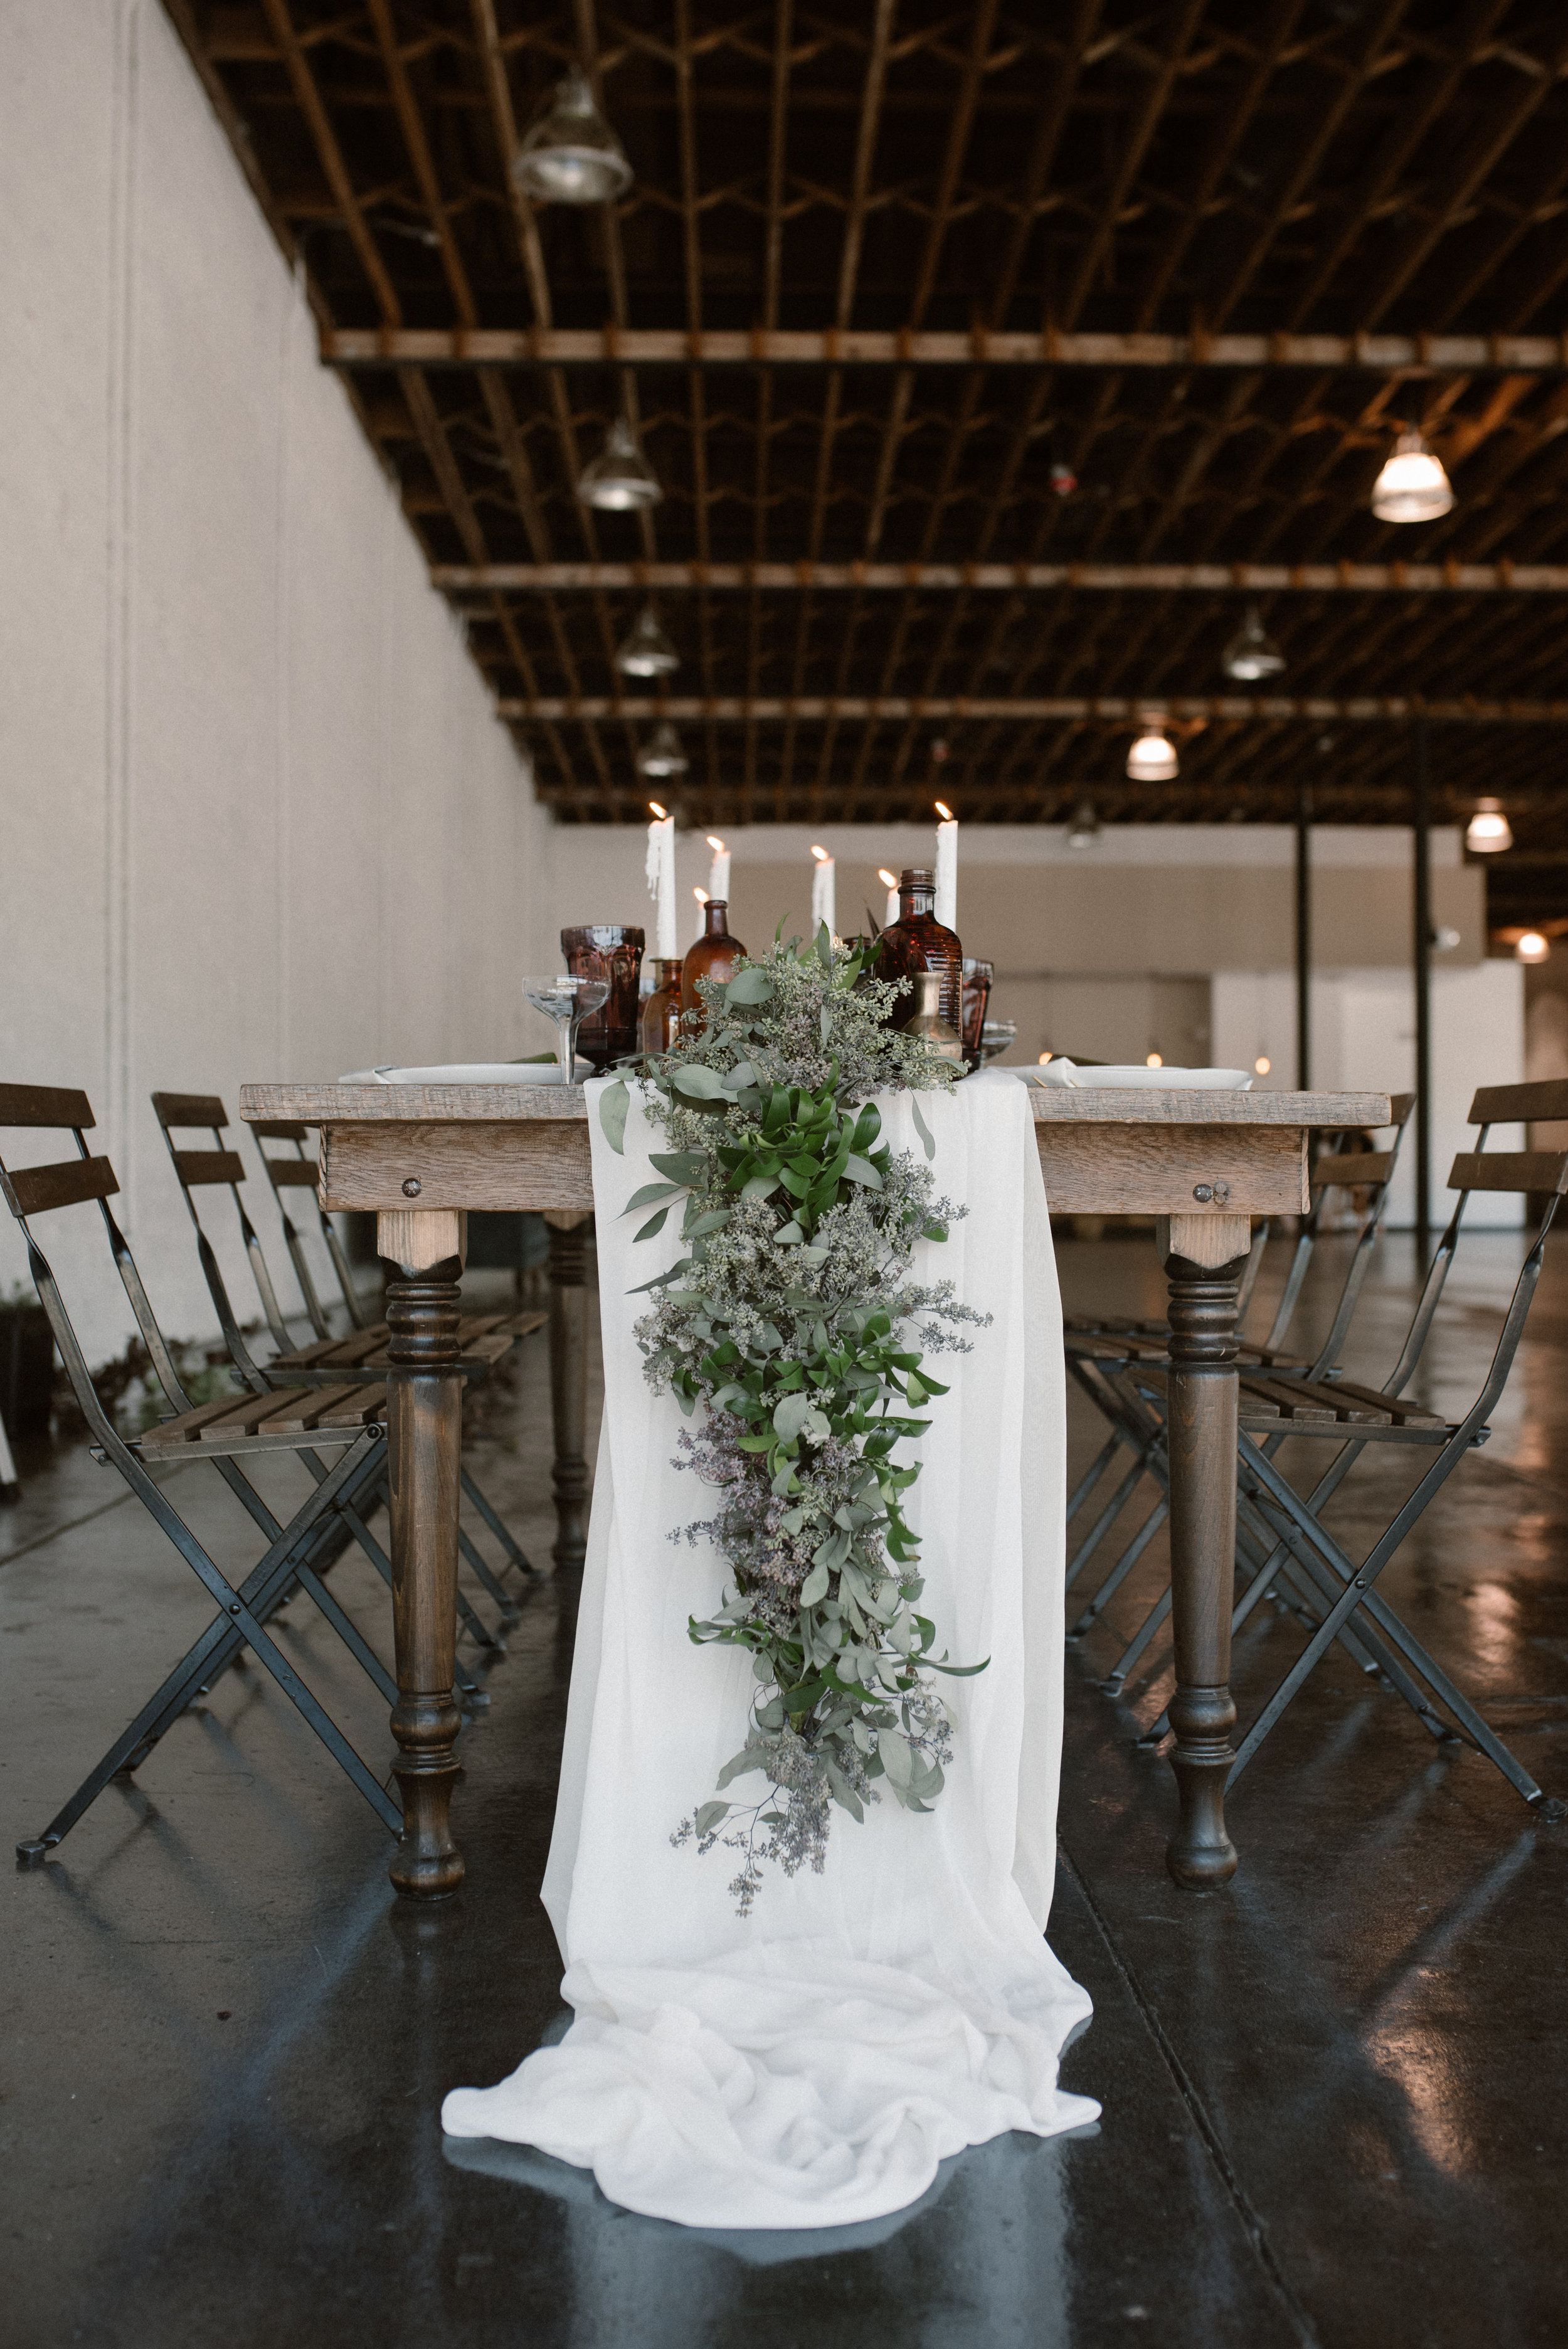 haus-820-minimal-editorial-wedding-styled-shoot-26.jpg